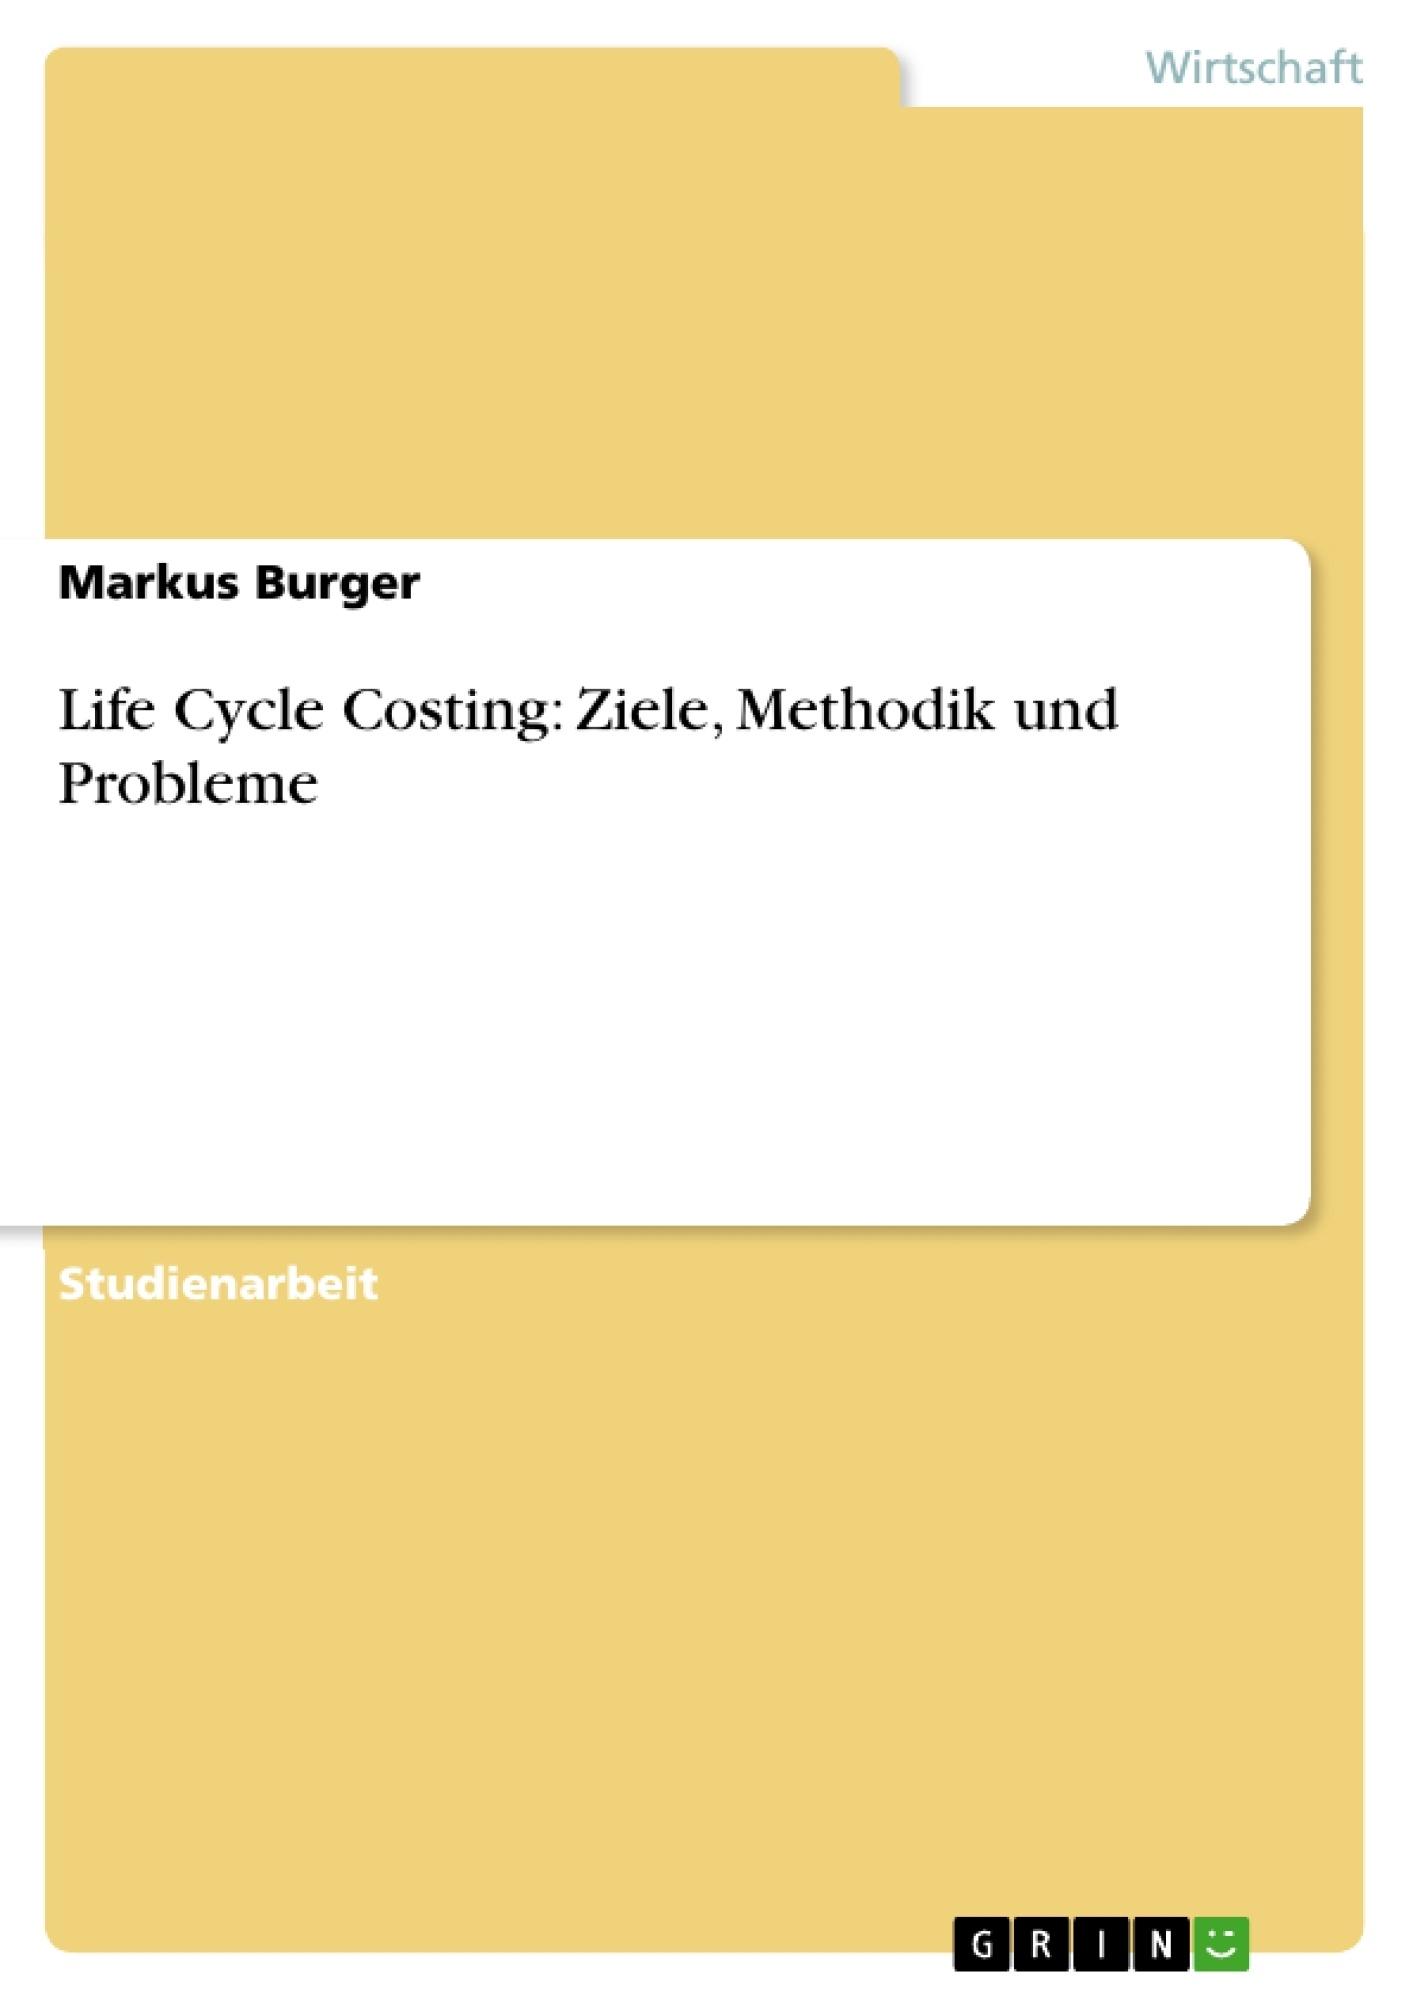 Titel: Life Cycle Costing: Ziele, Methodik und Probleme